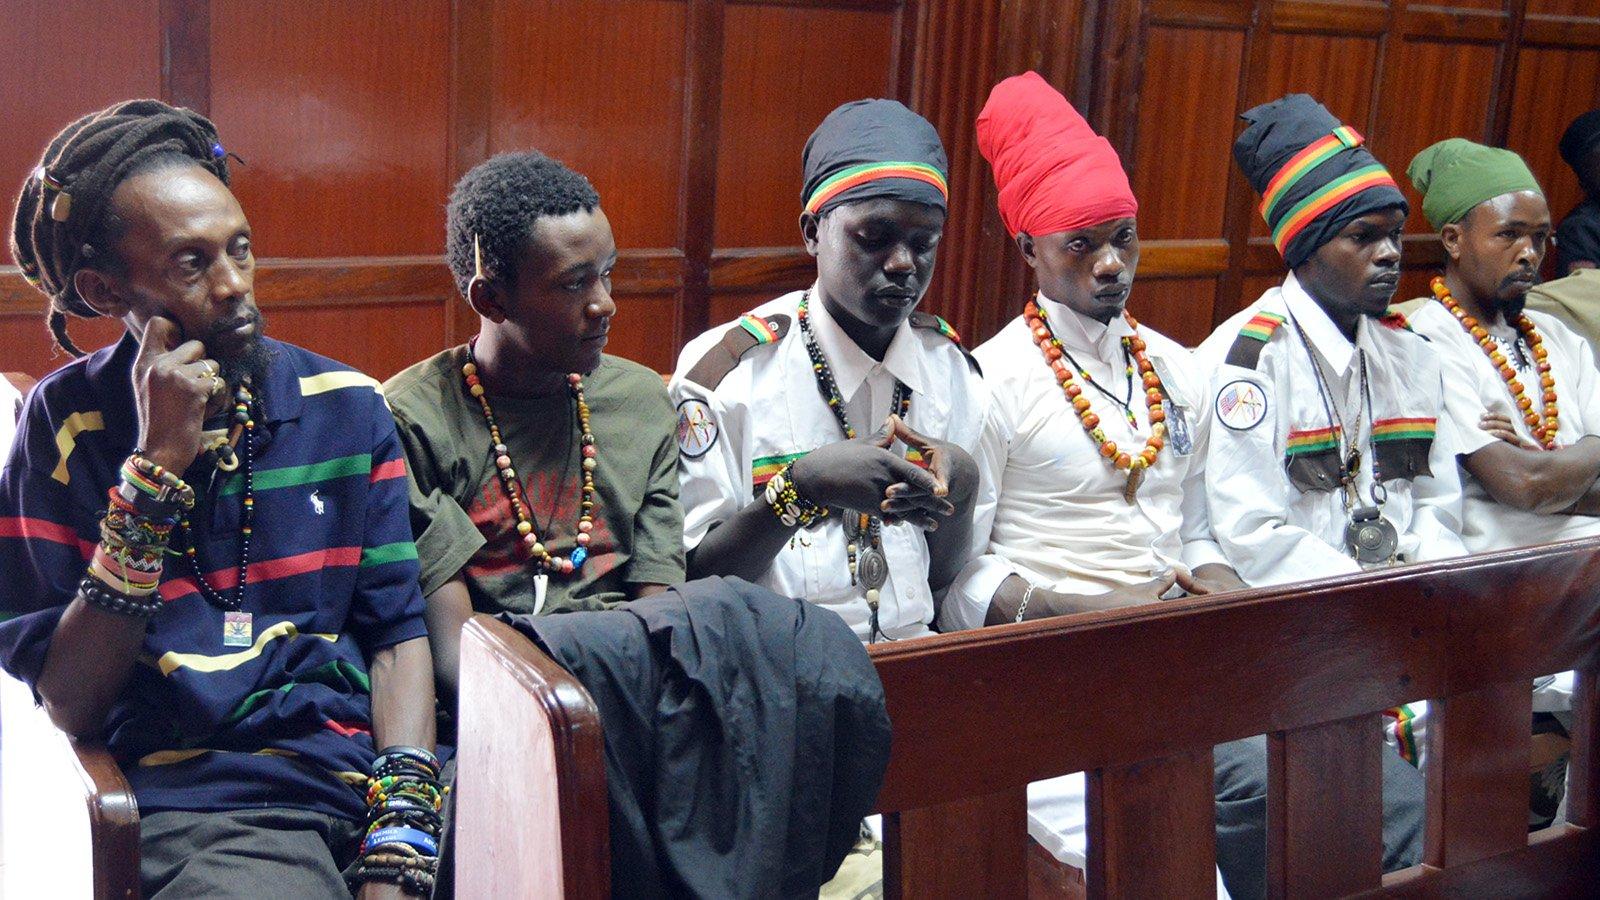 Rastafarianism, promising freedom, spreads among African